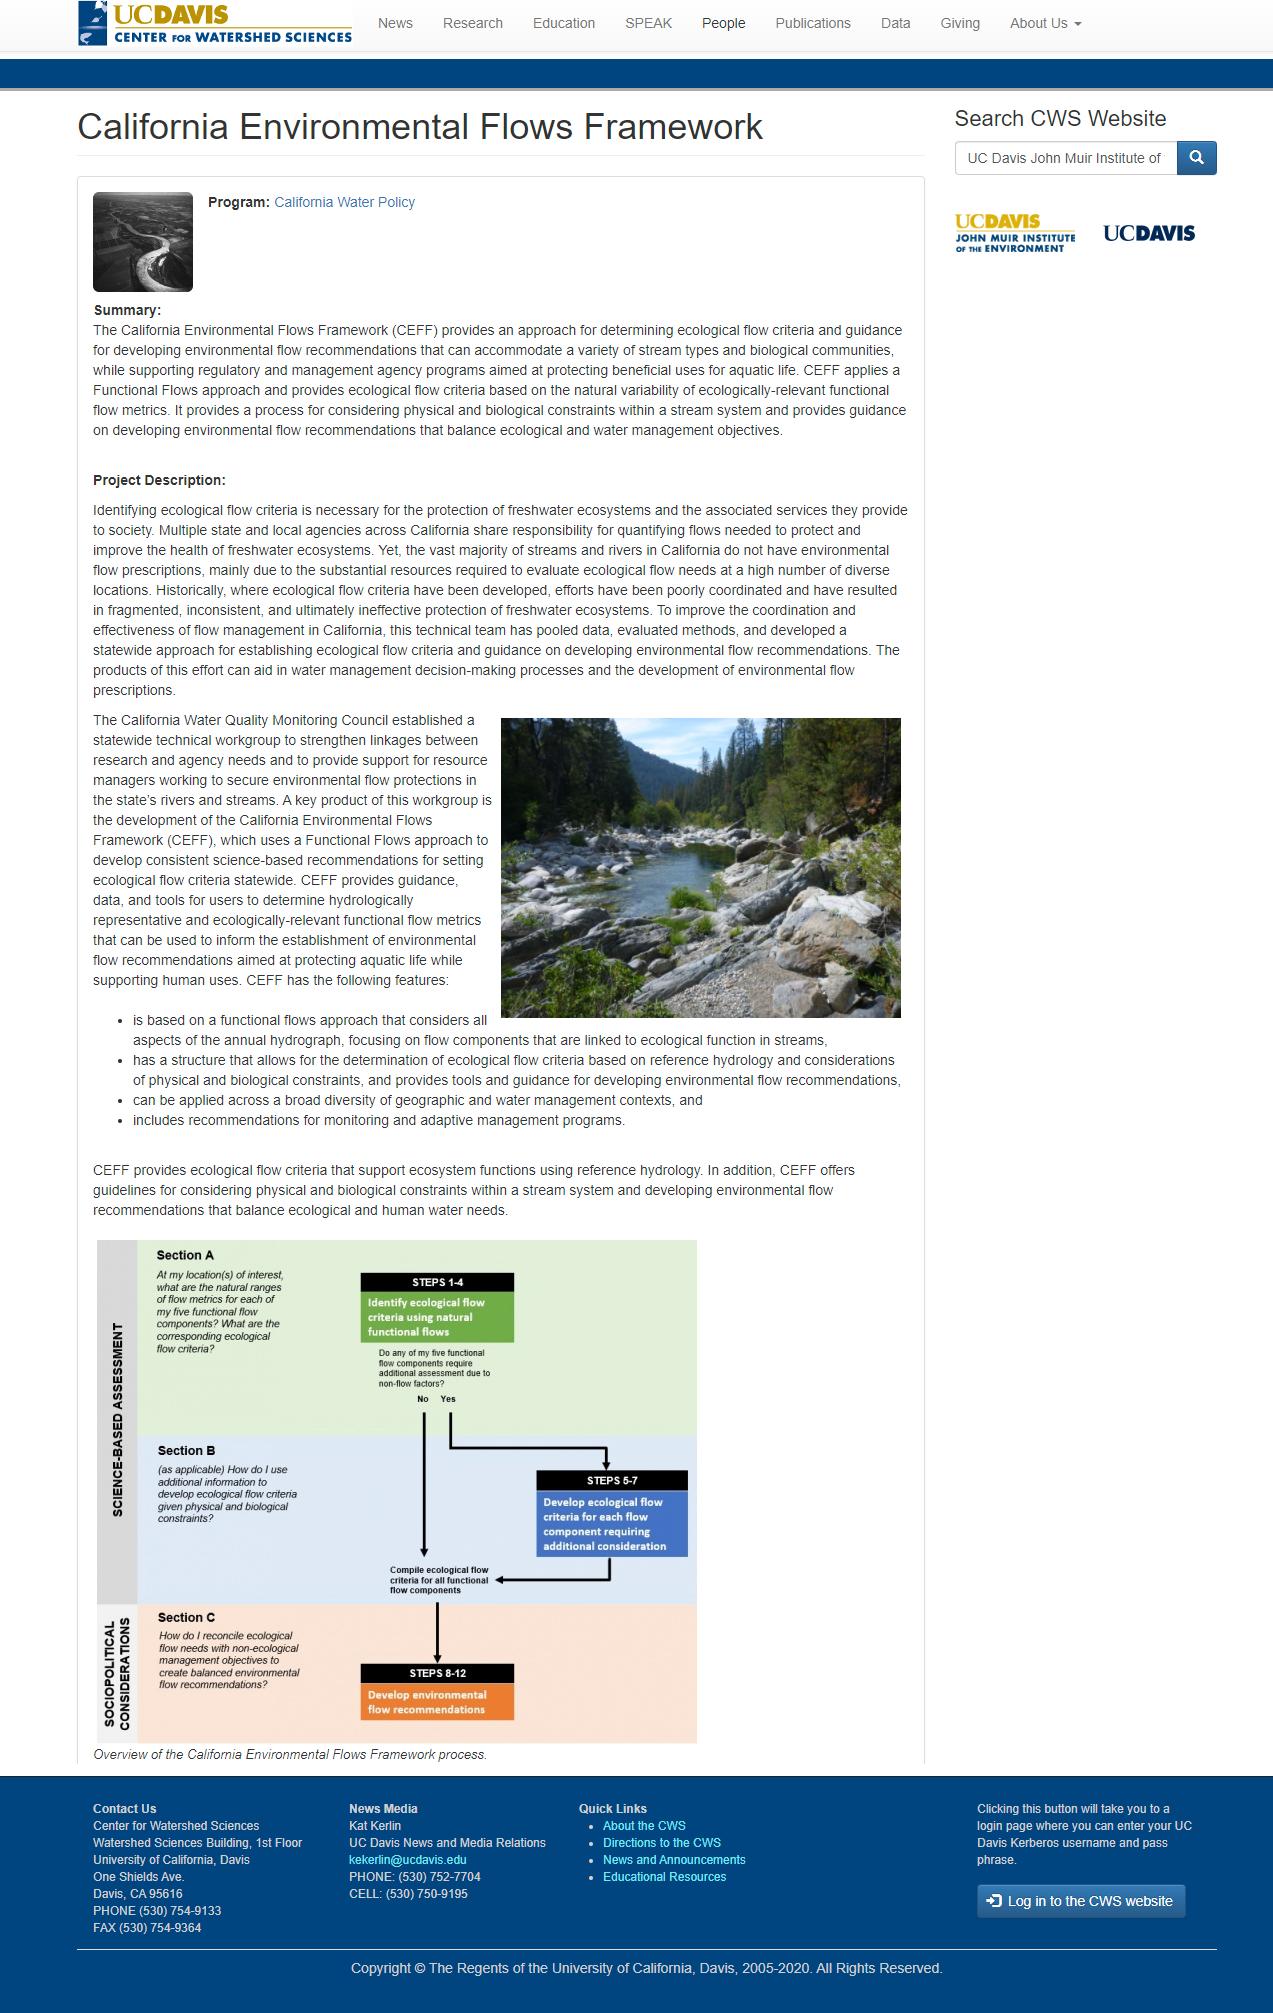 California Environmental Flows Framework